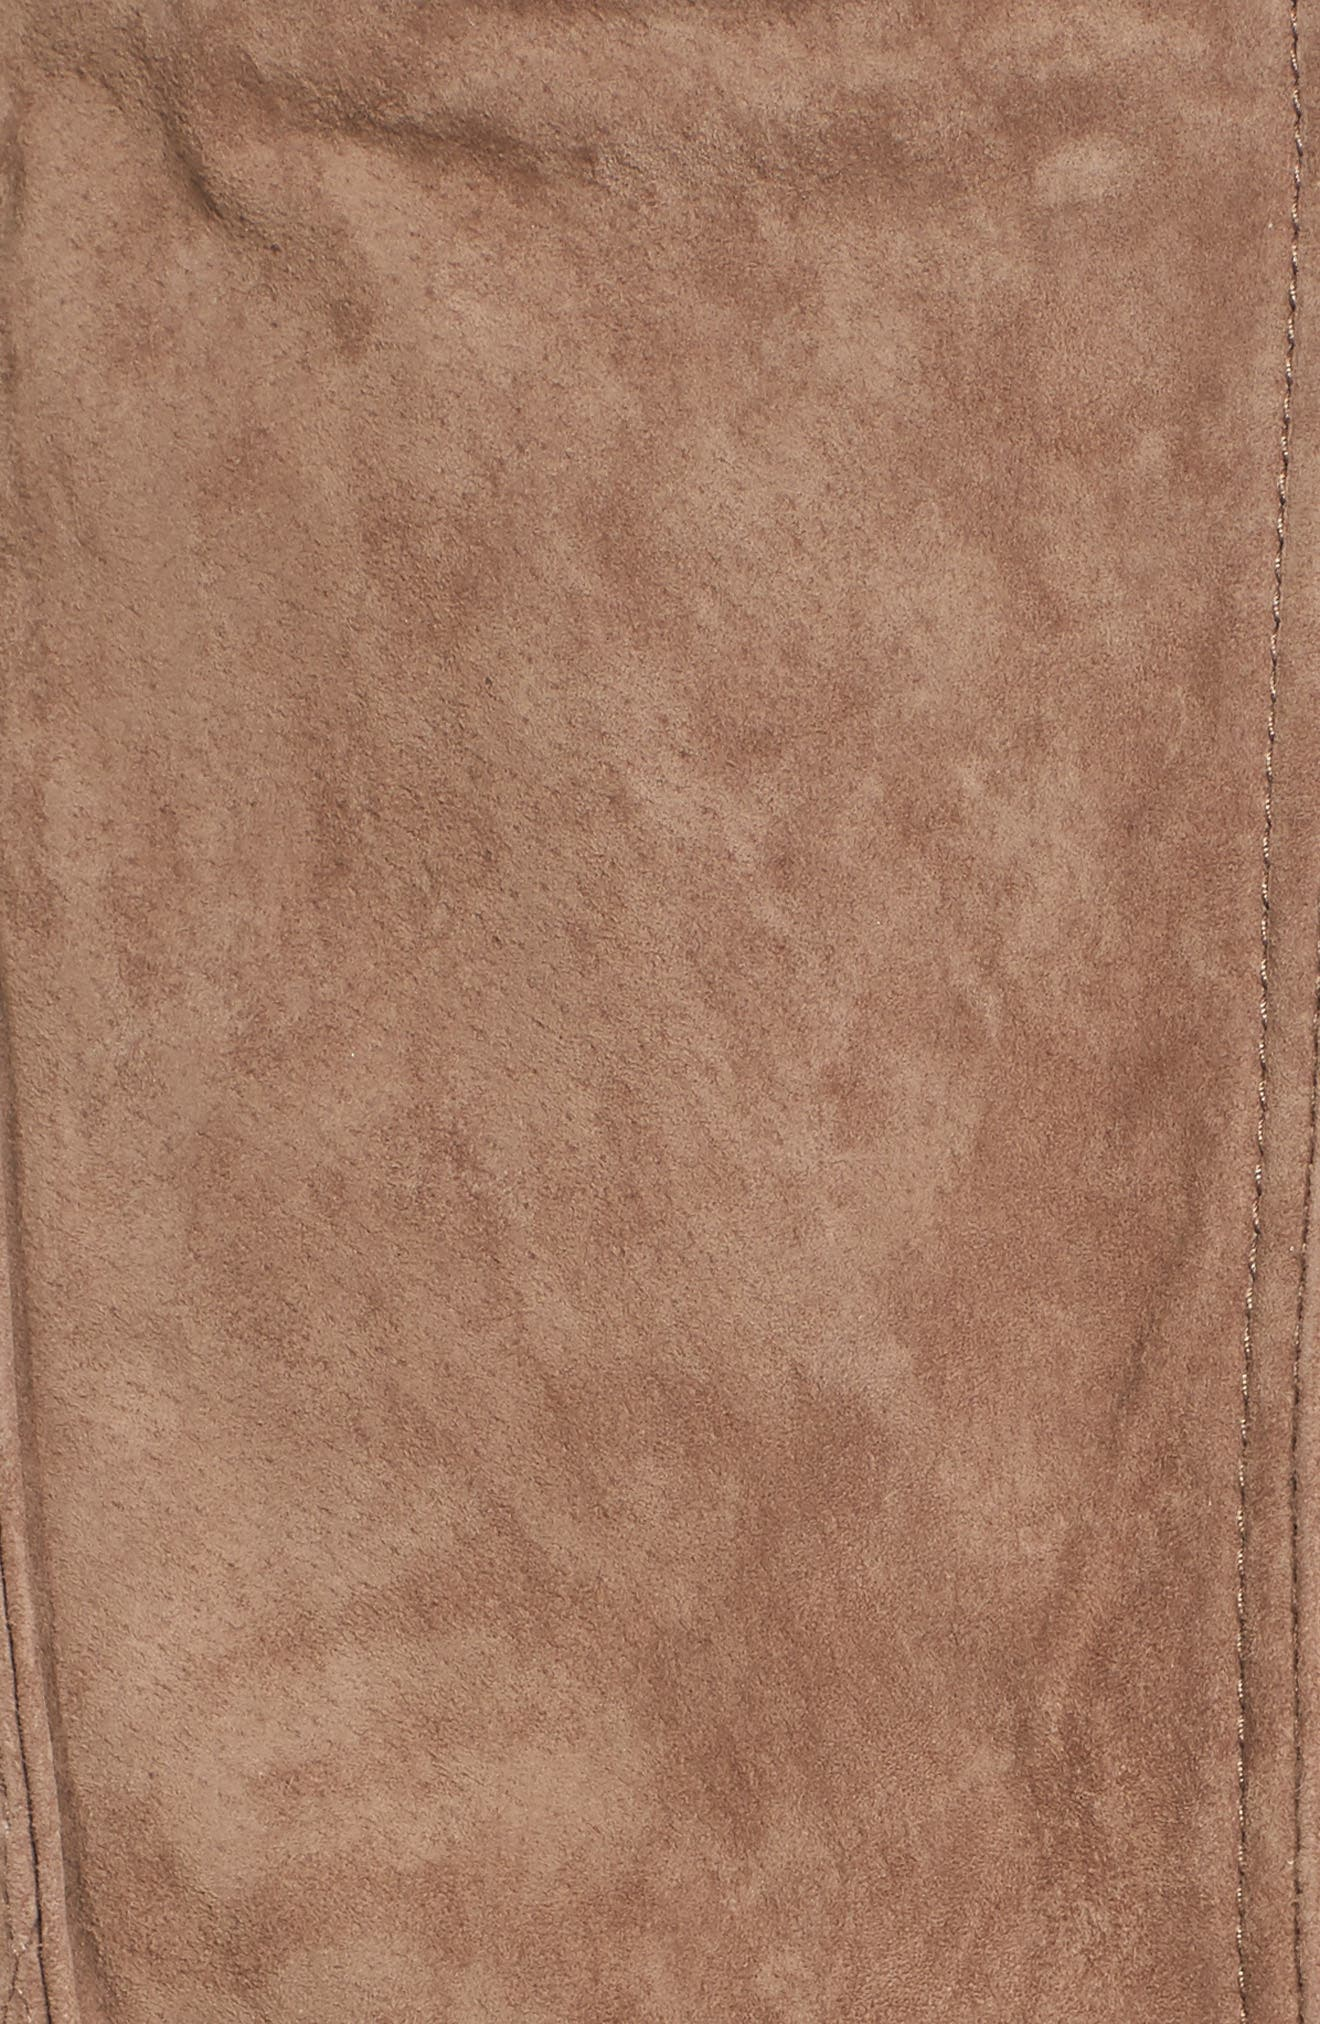 Crop Suede Moto Jacket,                             Alternate thumbnail 6, color,                             250